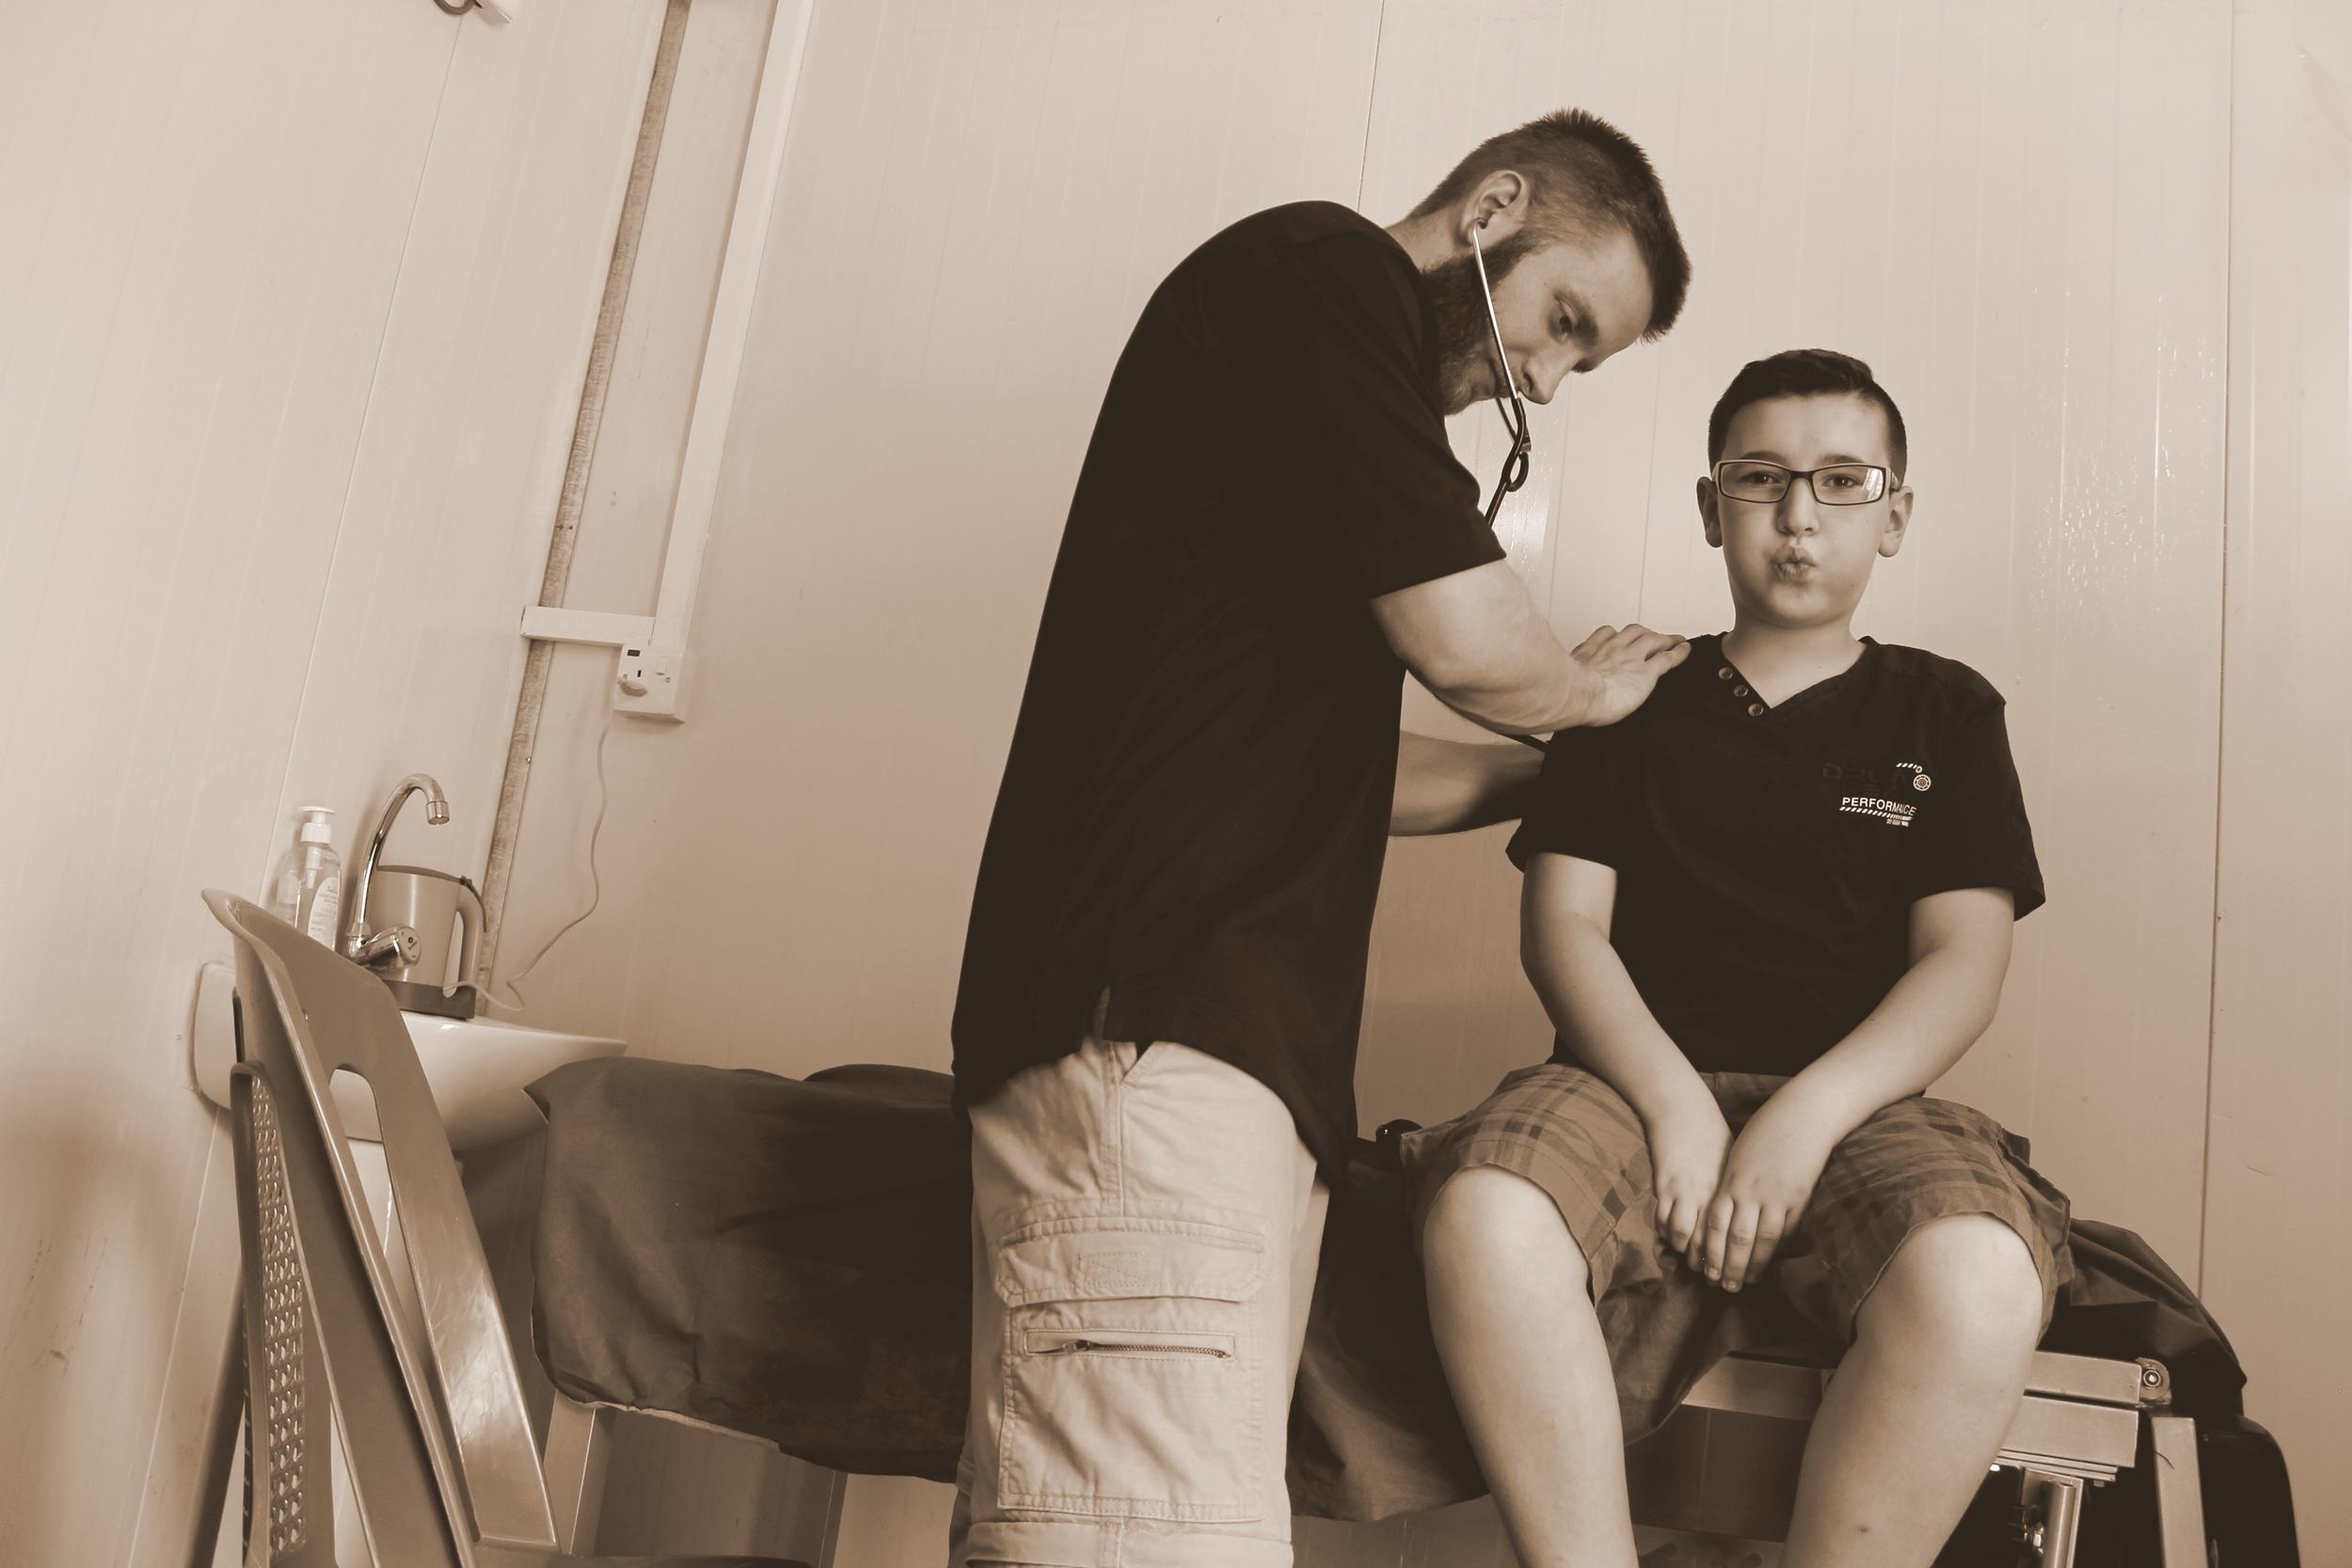 GSMSG medical team members providing basic physical exams